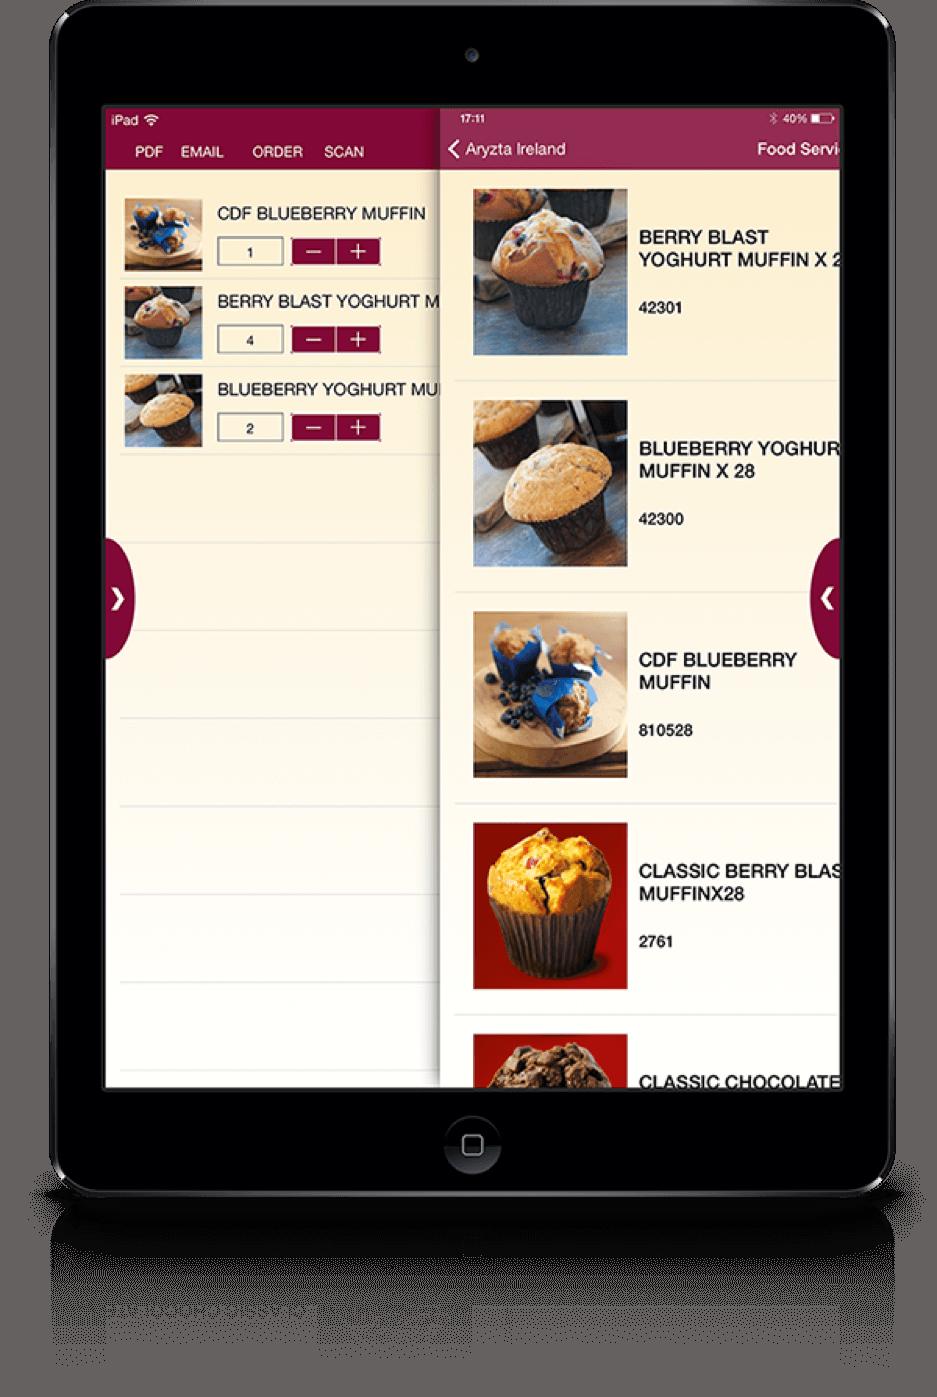 valantic-case-study-aryzta-food-europe-en-iPad